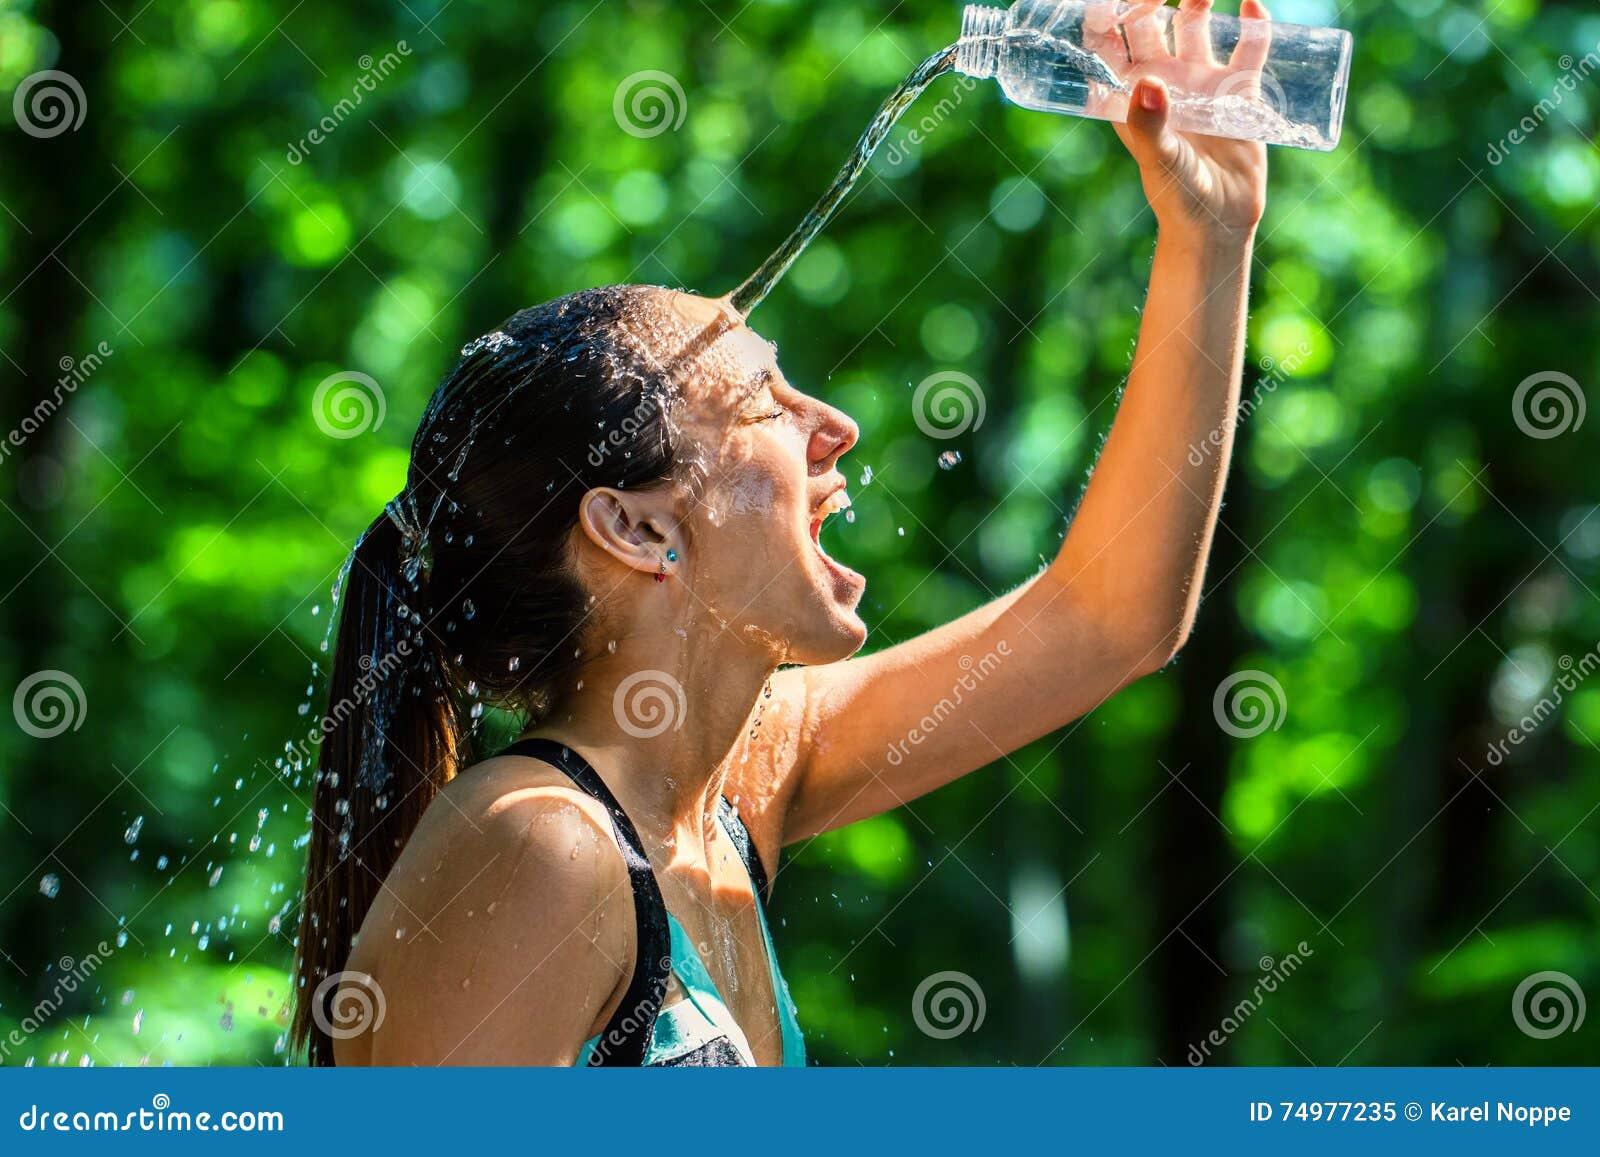 Вода девушки лить на стороне после разминки